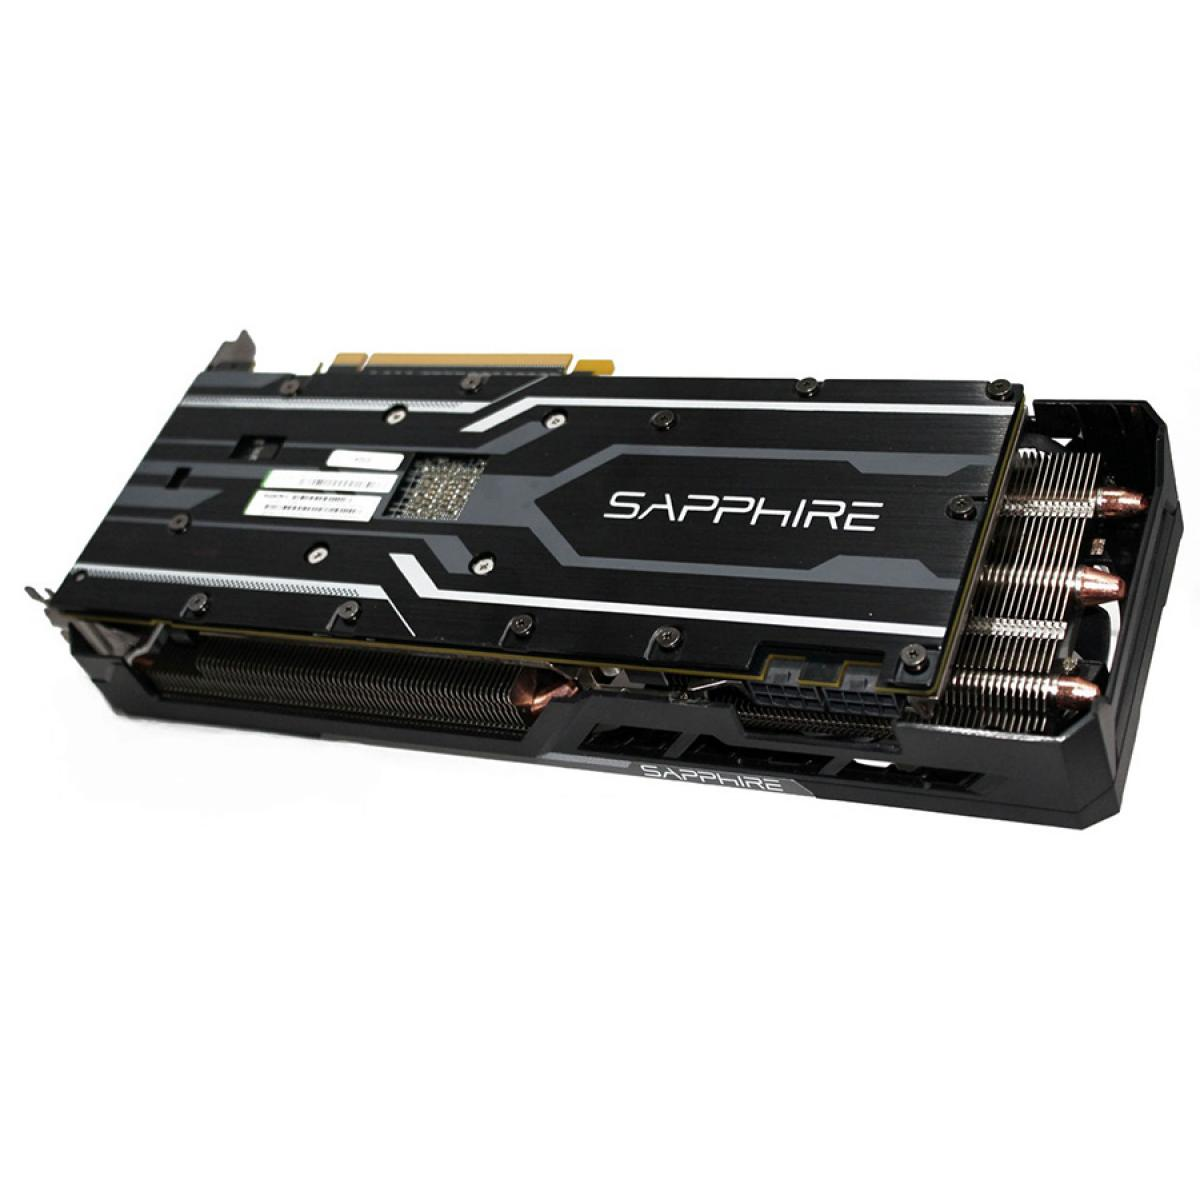 Sapphire Nitro AMD Radeon R9 390 8GB GDDR5